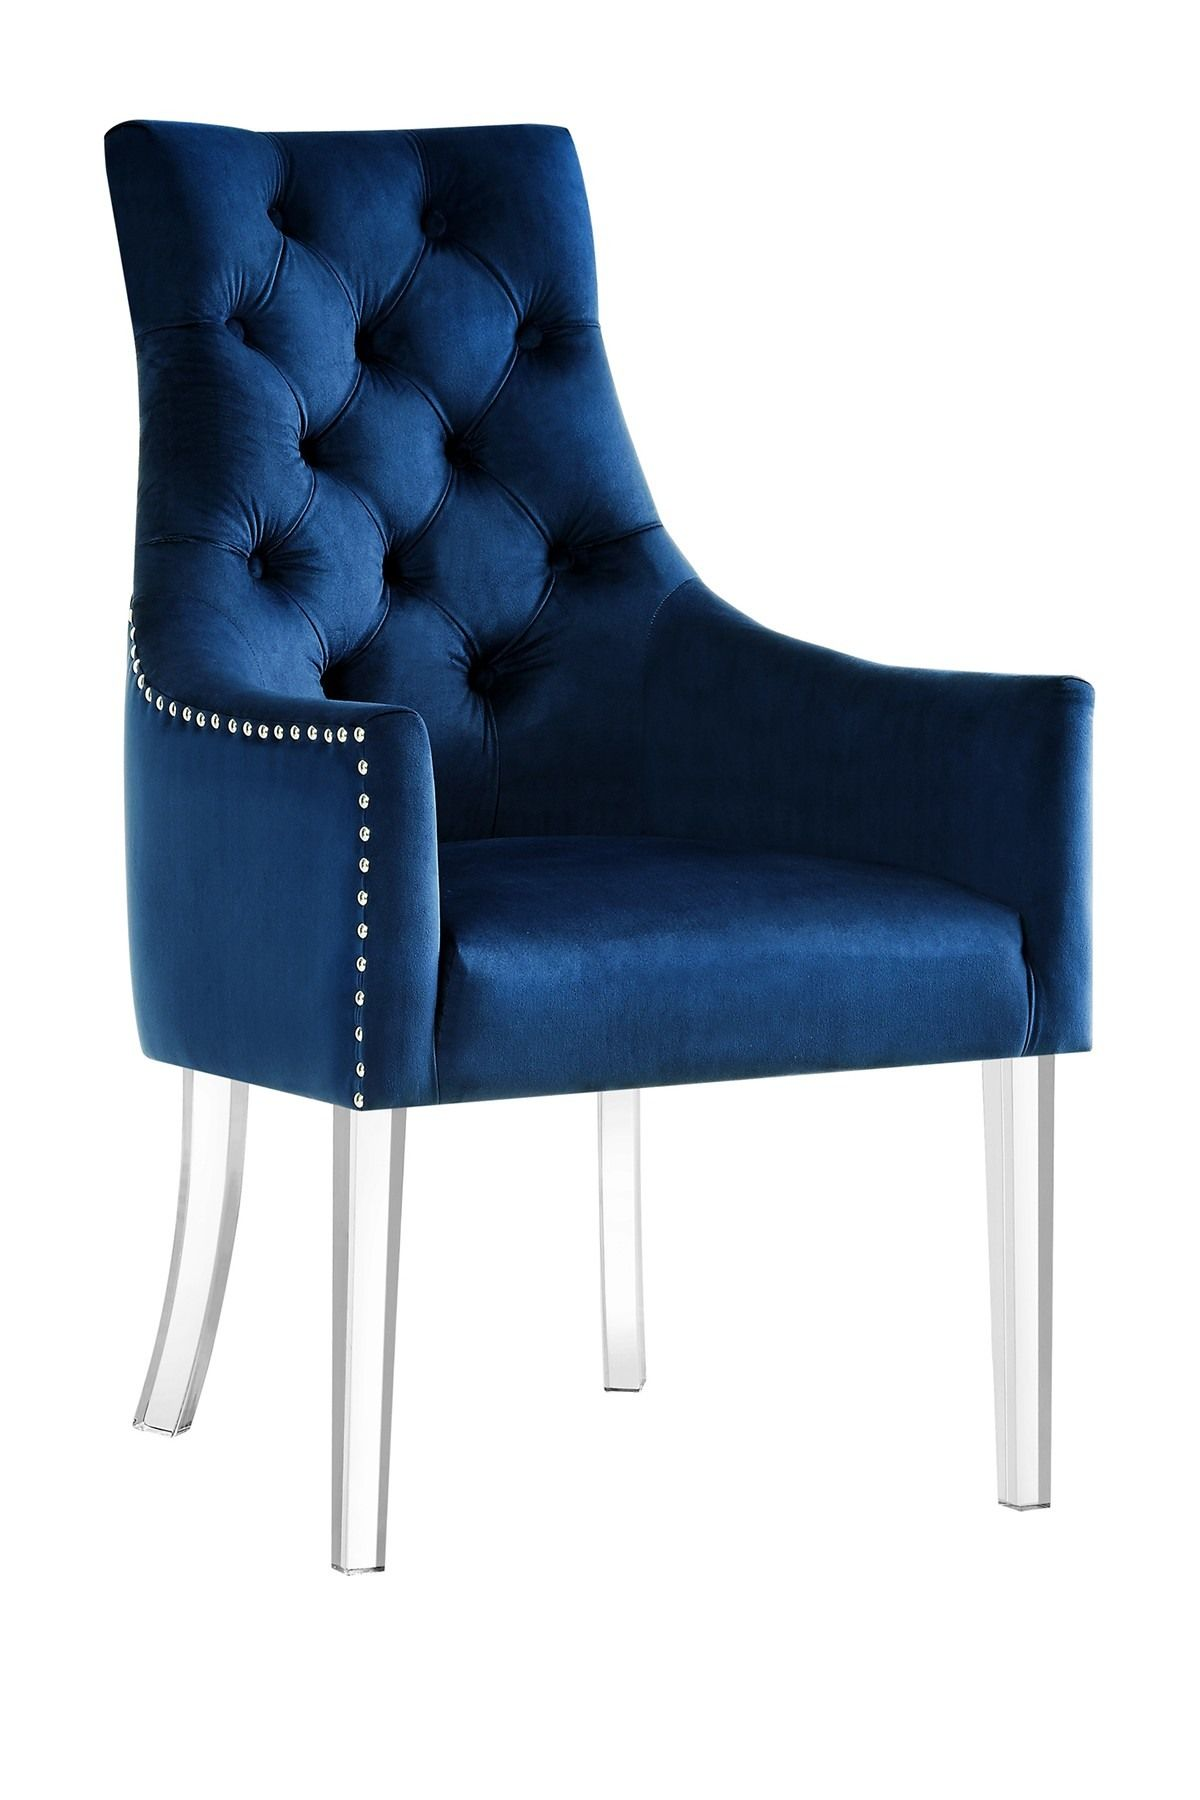 navy blue desk chair uk